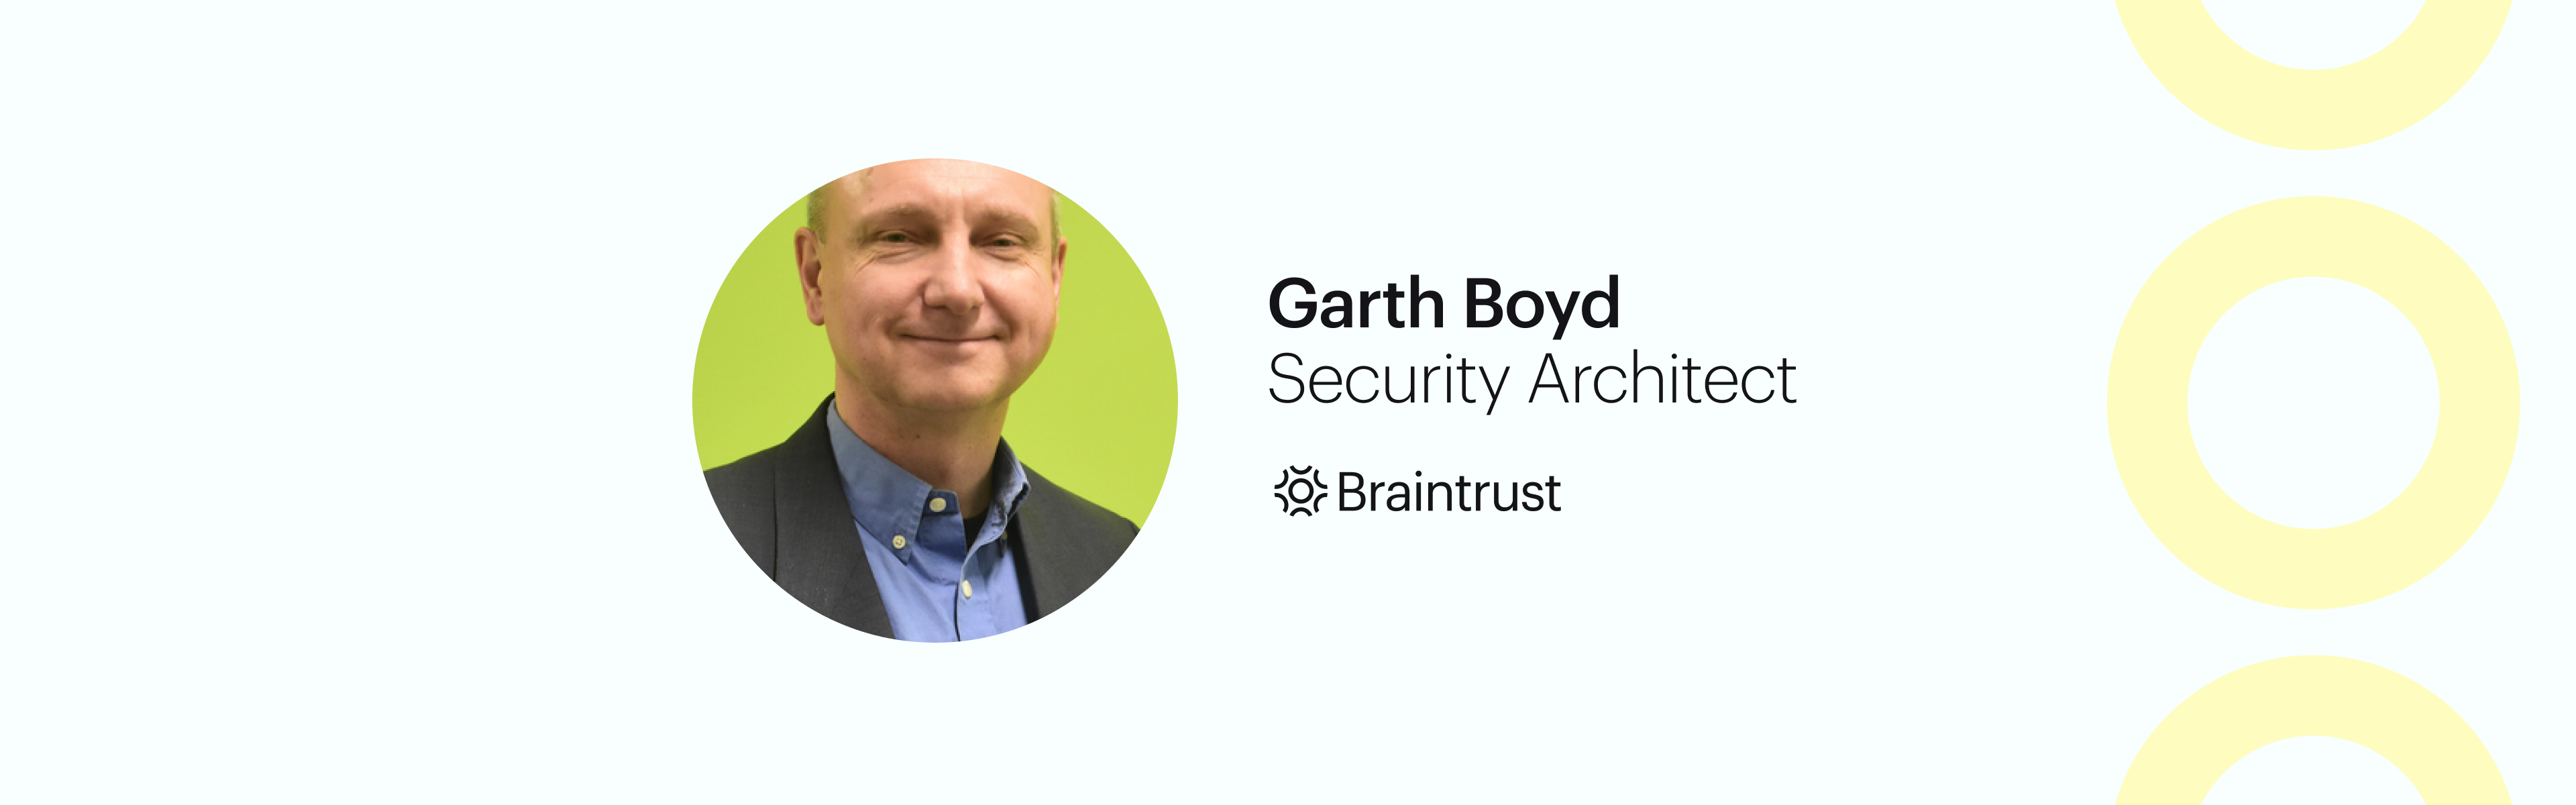 Talent Feature_ Garth Boyd Braintrust Blog Banner-